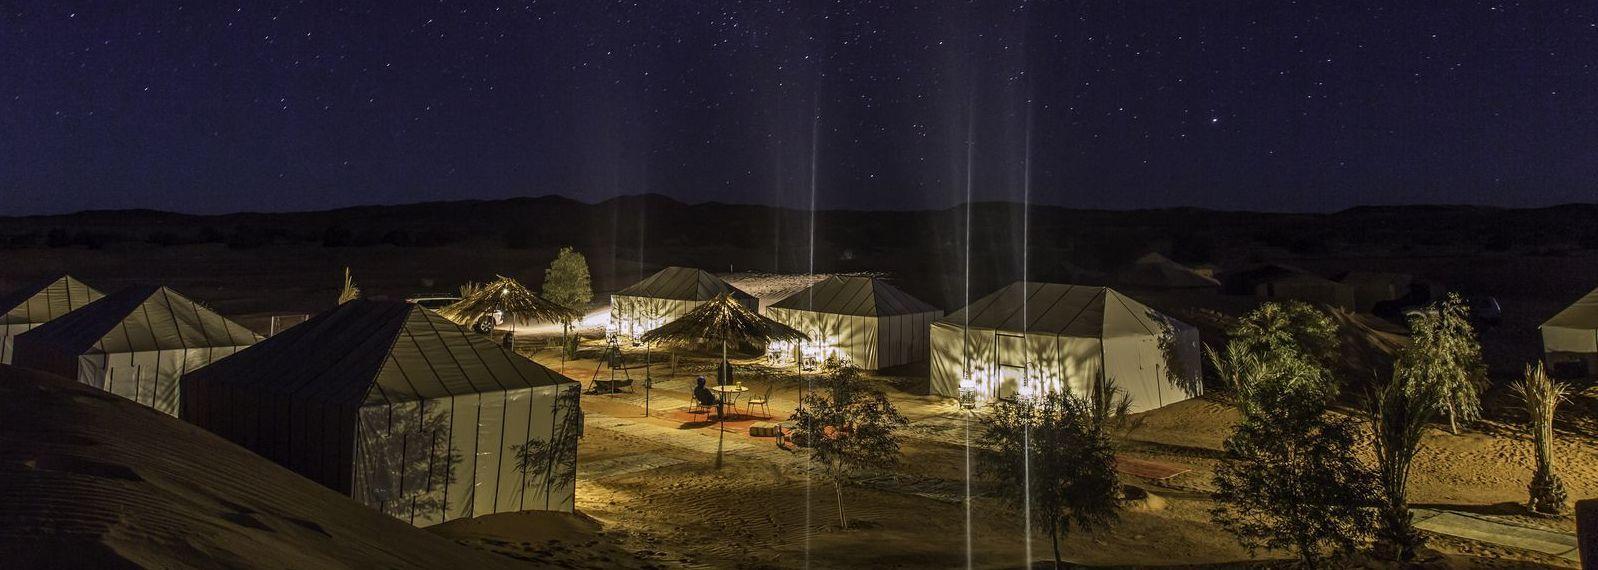 Azawad Luxury Desert Camp Merzouga!